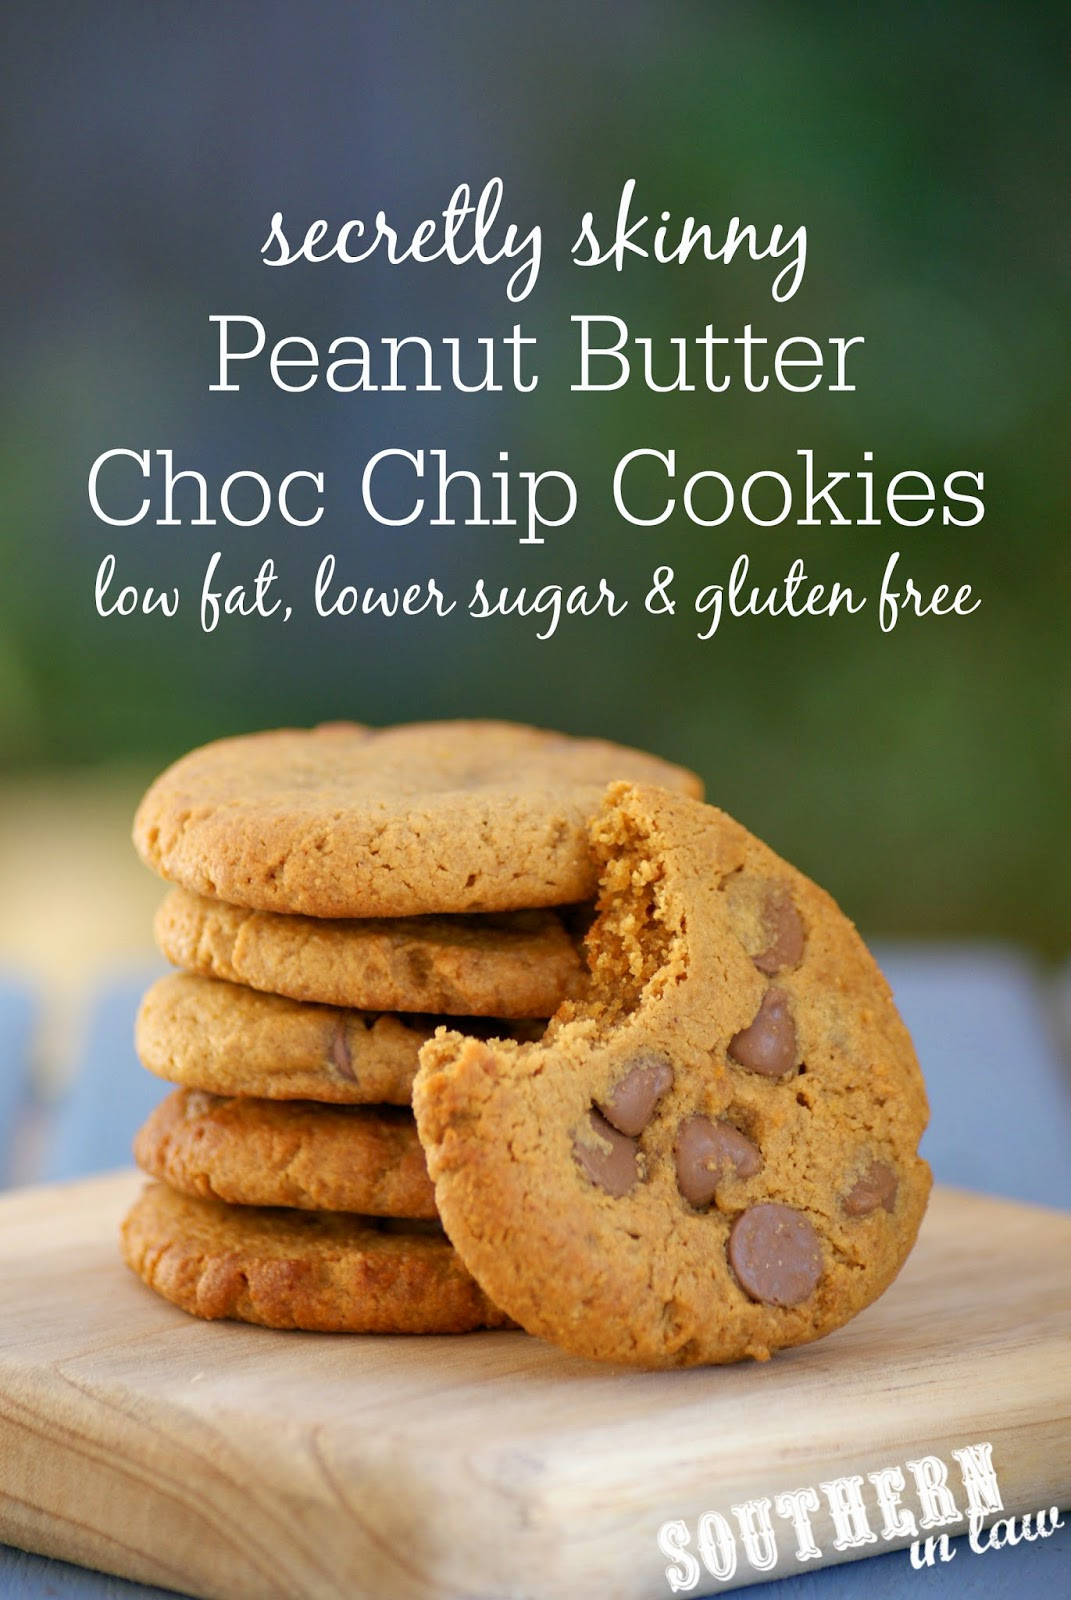 Low Fat Low Sugar Cookies  Southern In Law Recipe Secretly Skinny Peanut Butter